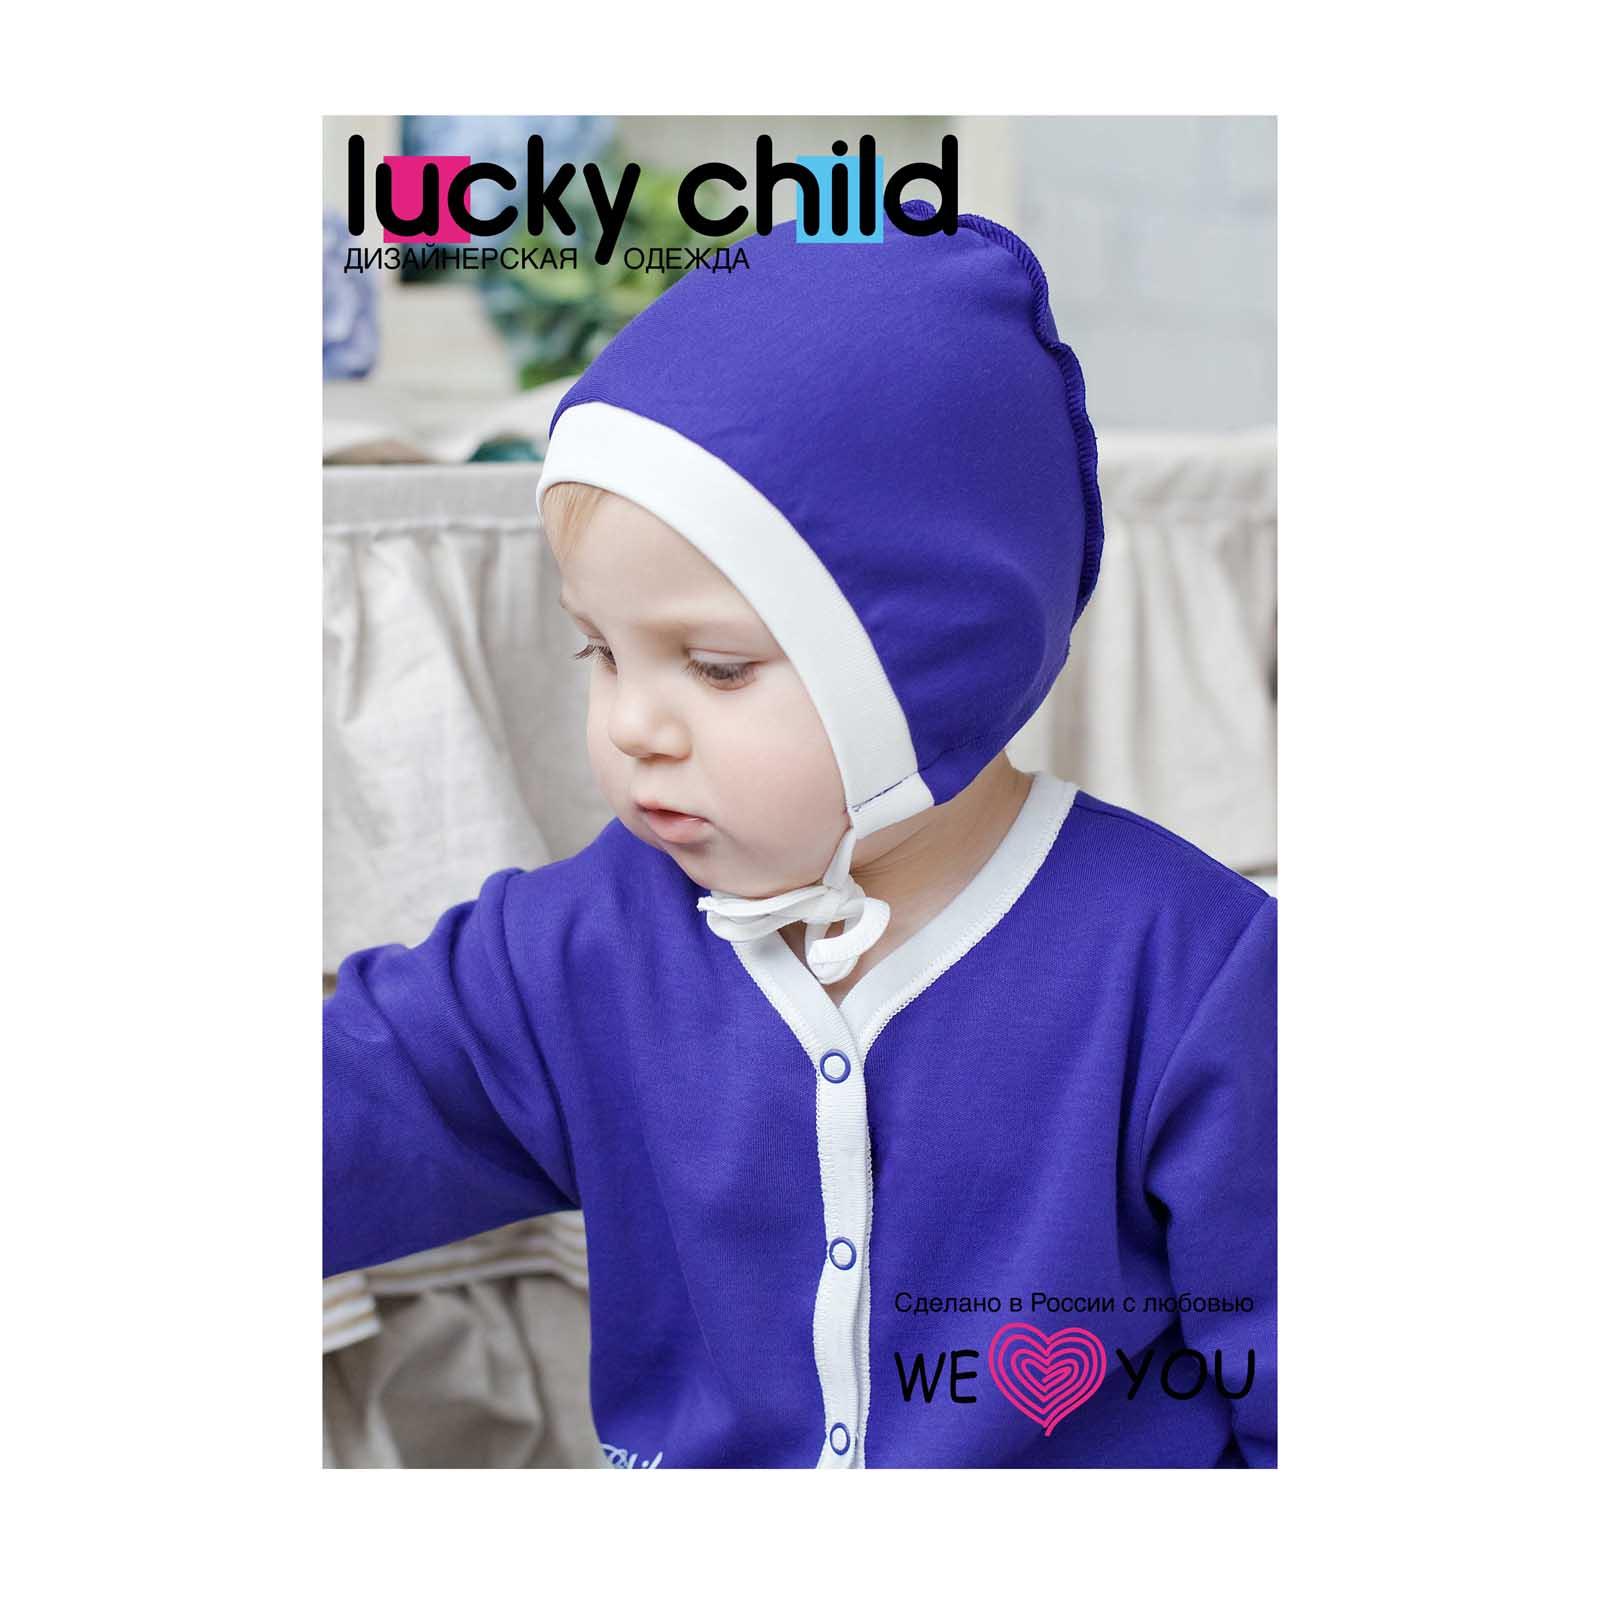 ������ Lucky Child, ��������� ��������, ���� ���������� � ����� ������� ������ 45